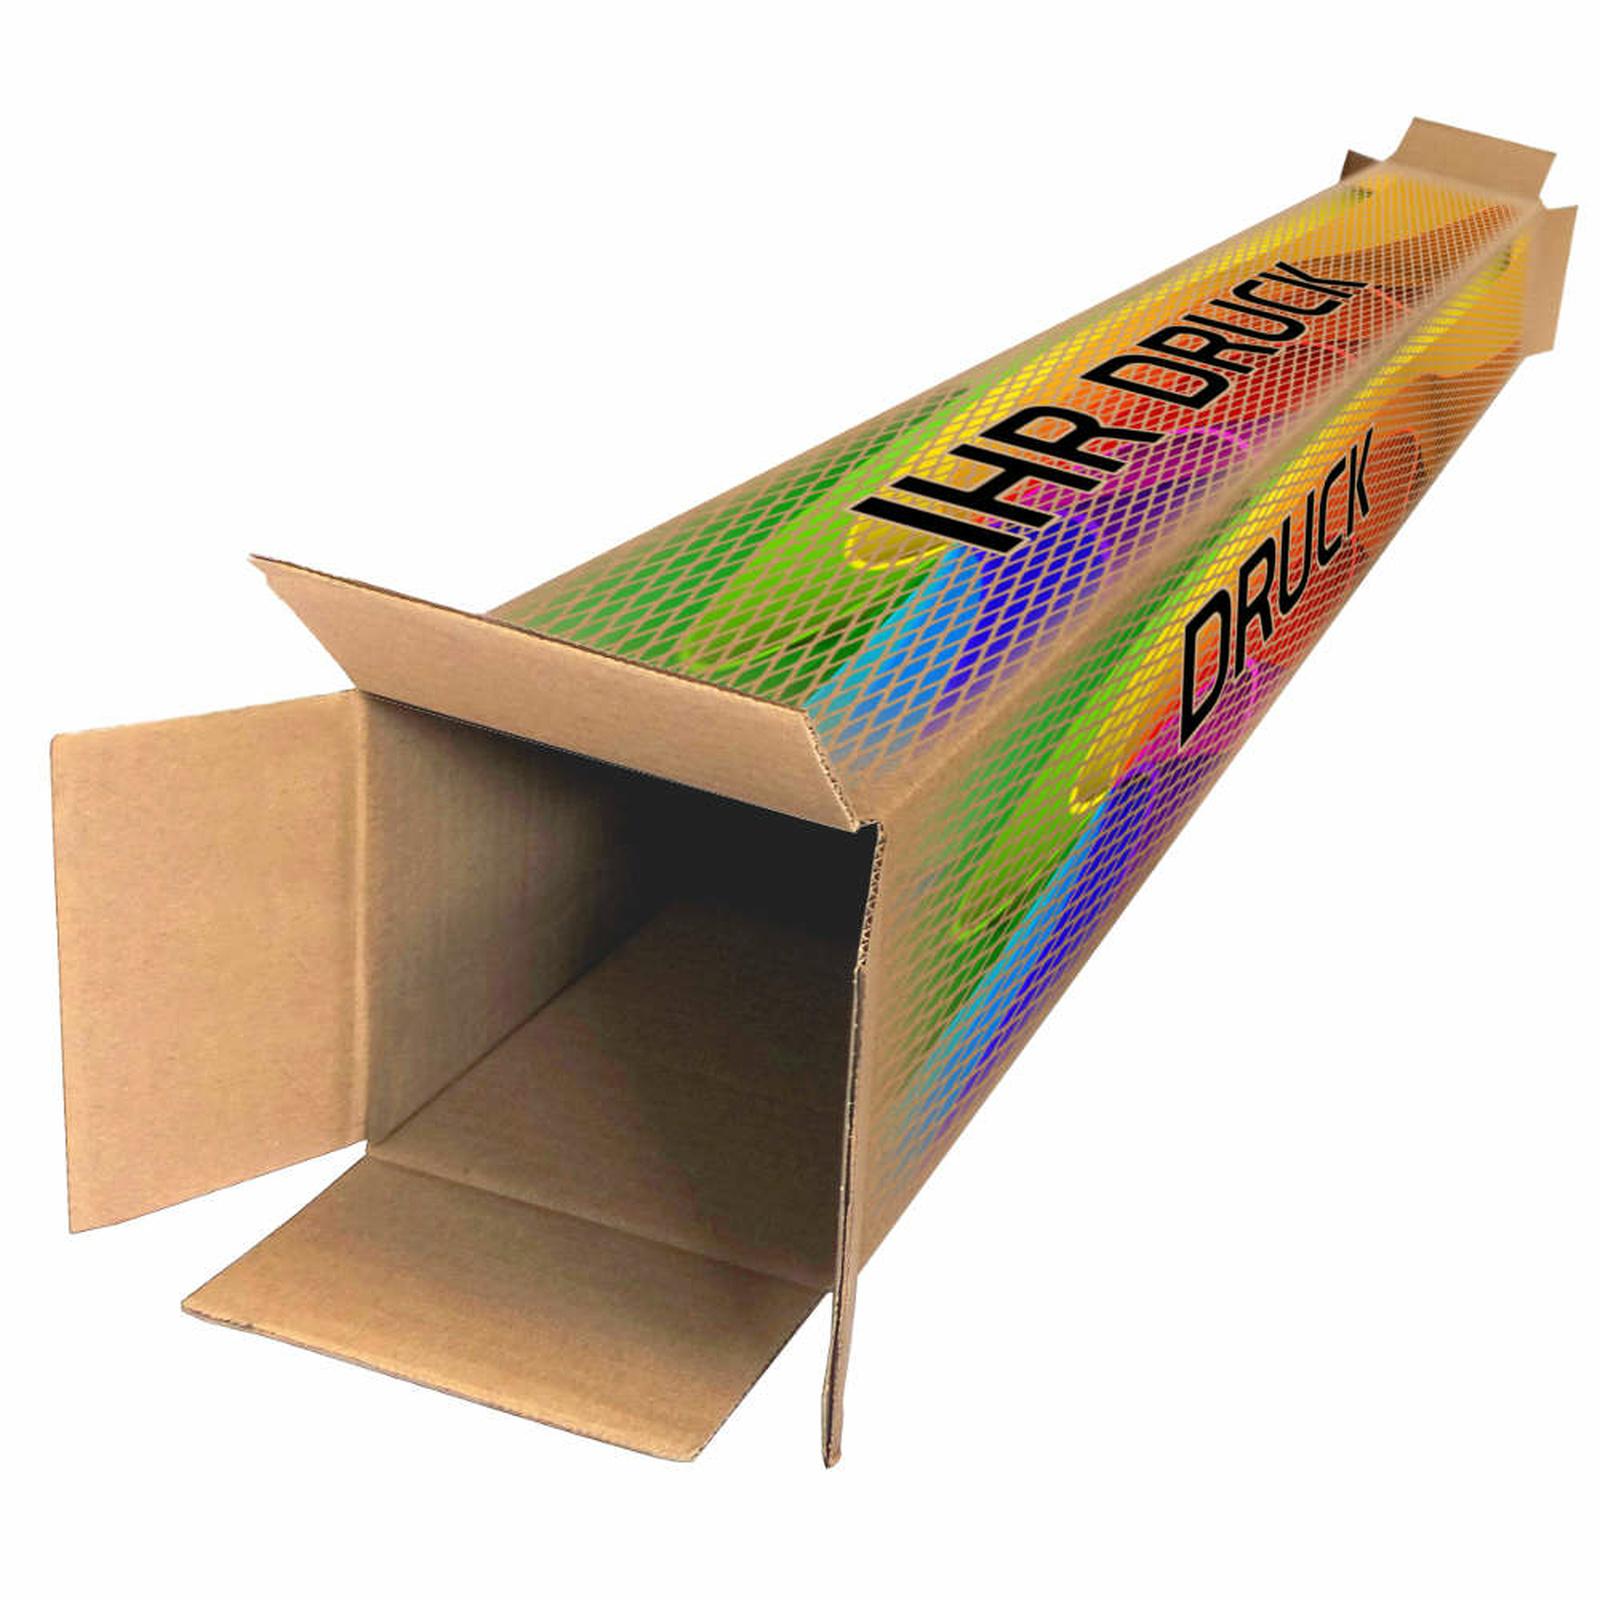 einwellige kartons 1189x120x120 mm g nstig kaufen 0 75. Black Bedroom Furniture Sets. Home Design Ideas